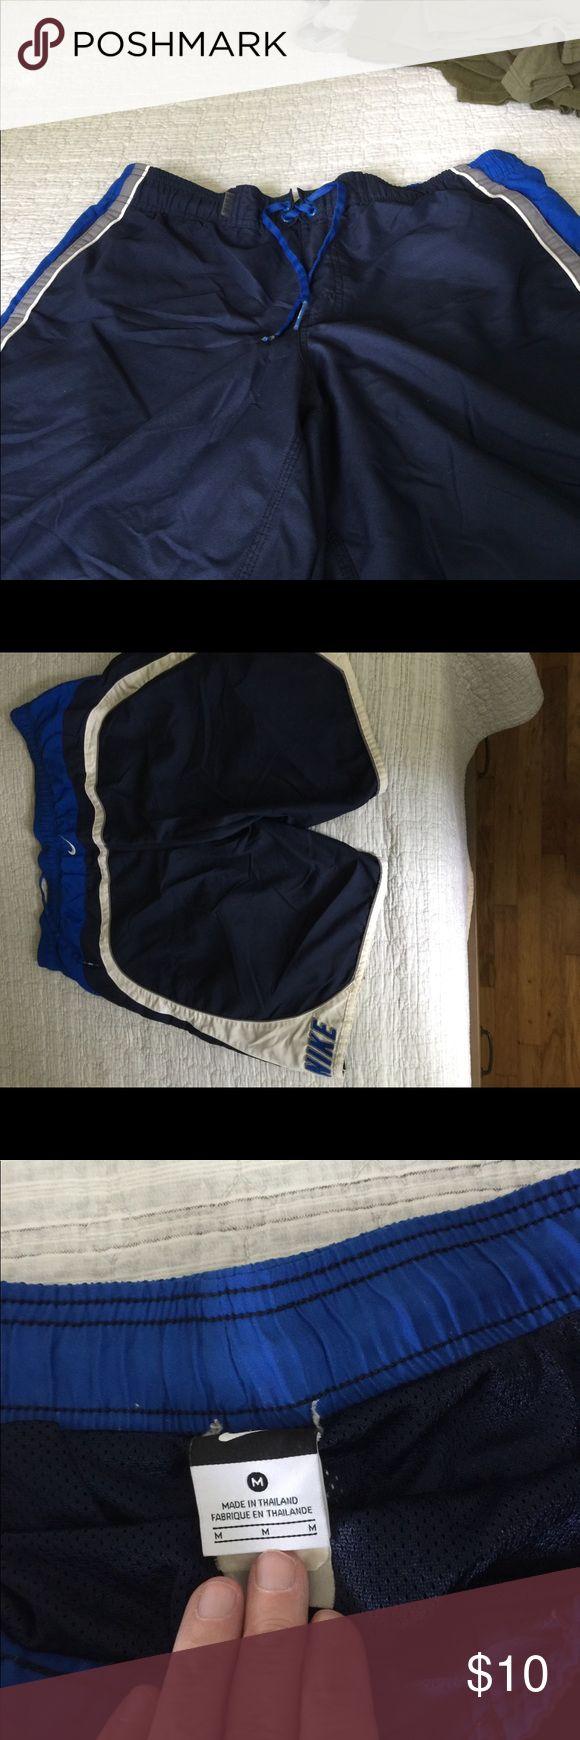 Nike swim shorts Nike swim shorts - size m Nike Swim Swim Trunks